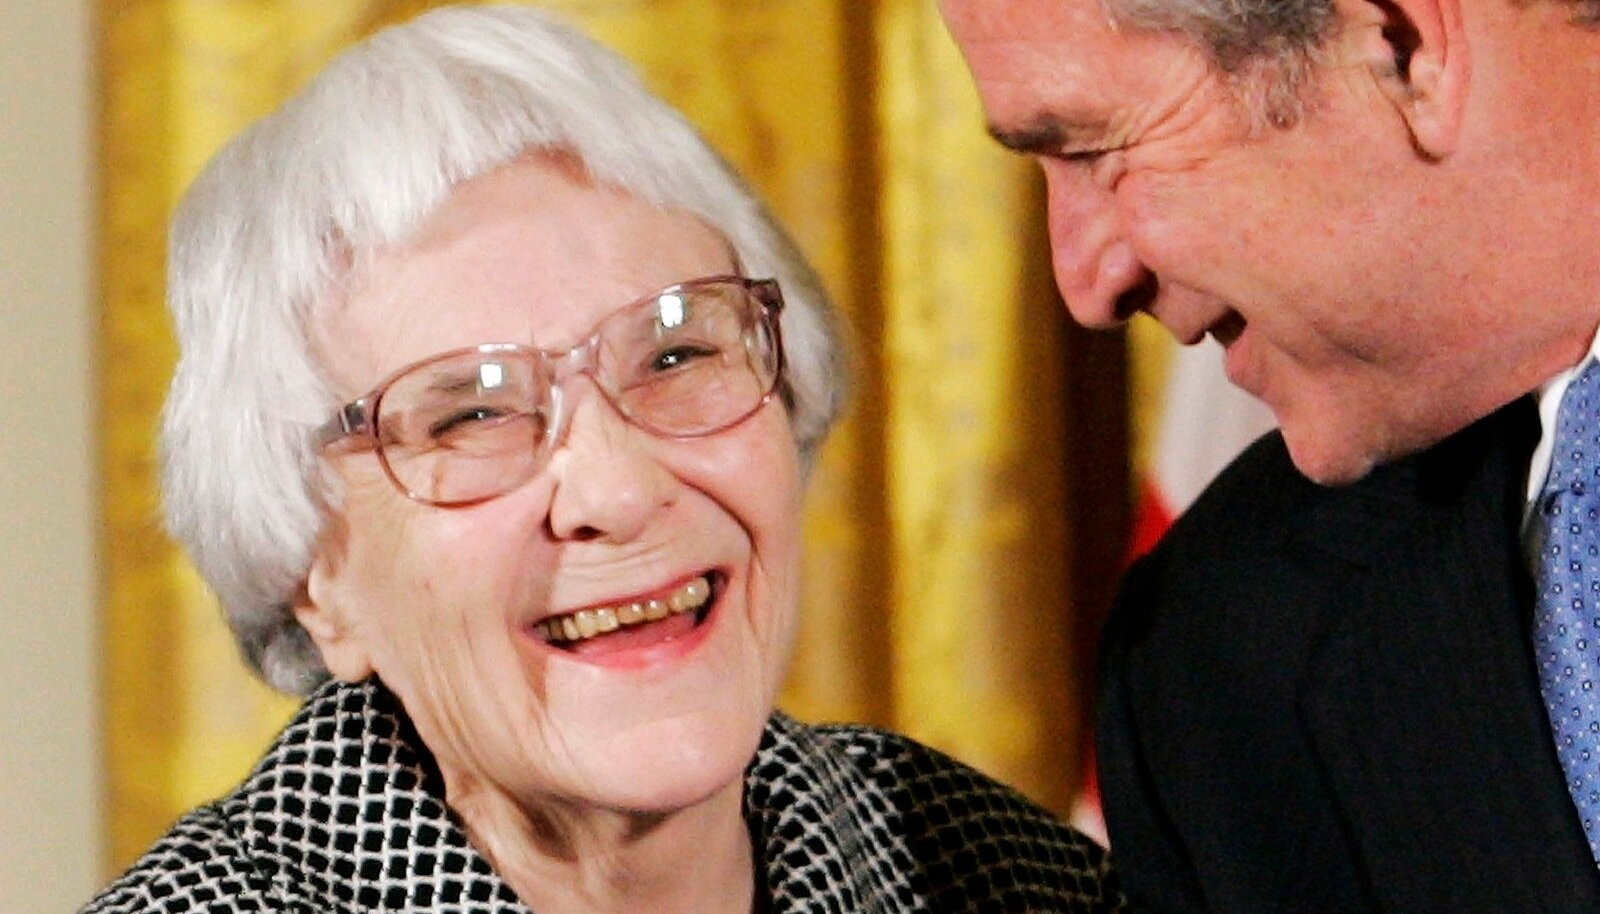 File photo of U.S. President George W. Bush awarding the Presidential Medal of Freedom in Washington